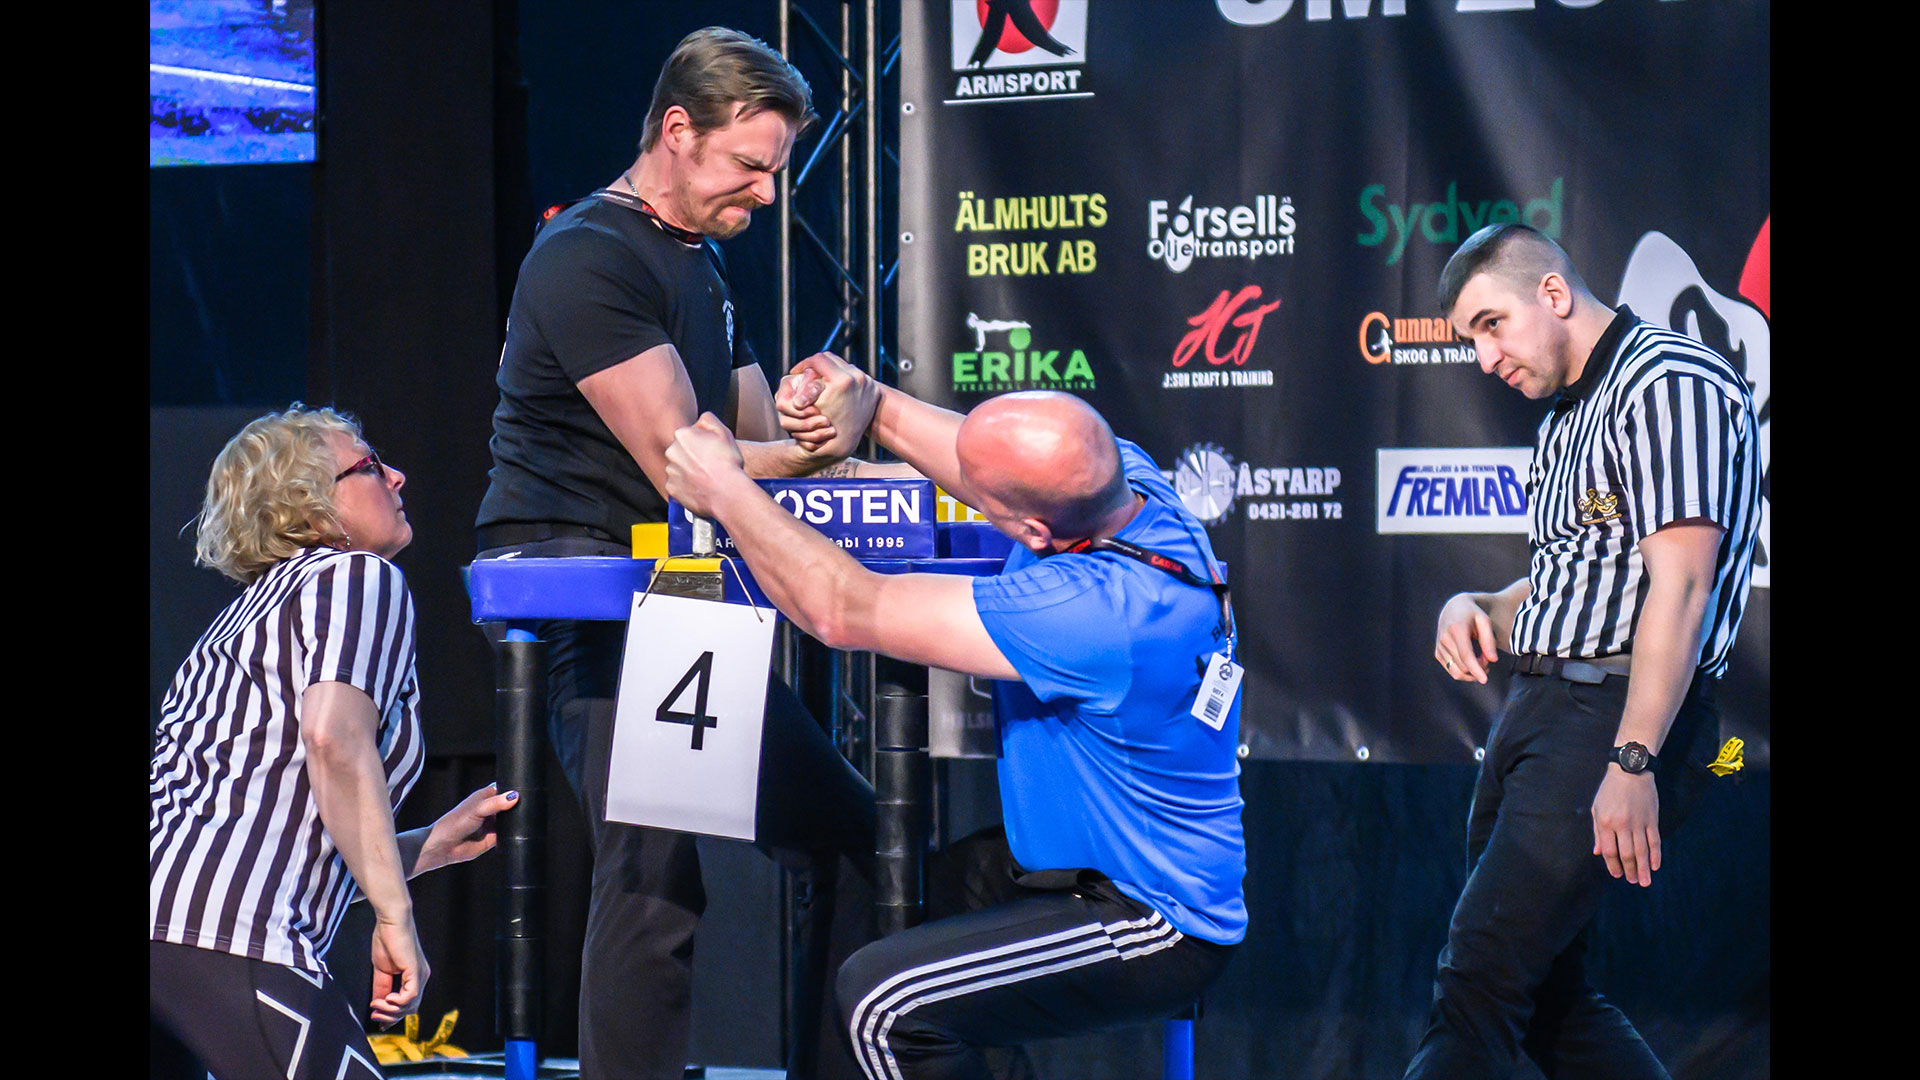 1 SM möte i armbrytning - Torsten Bynke